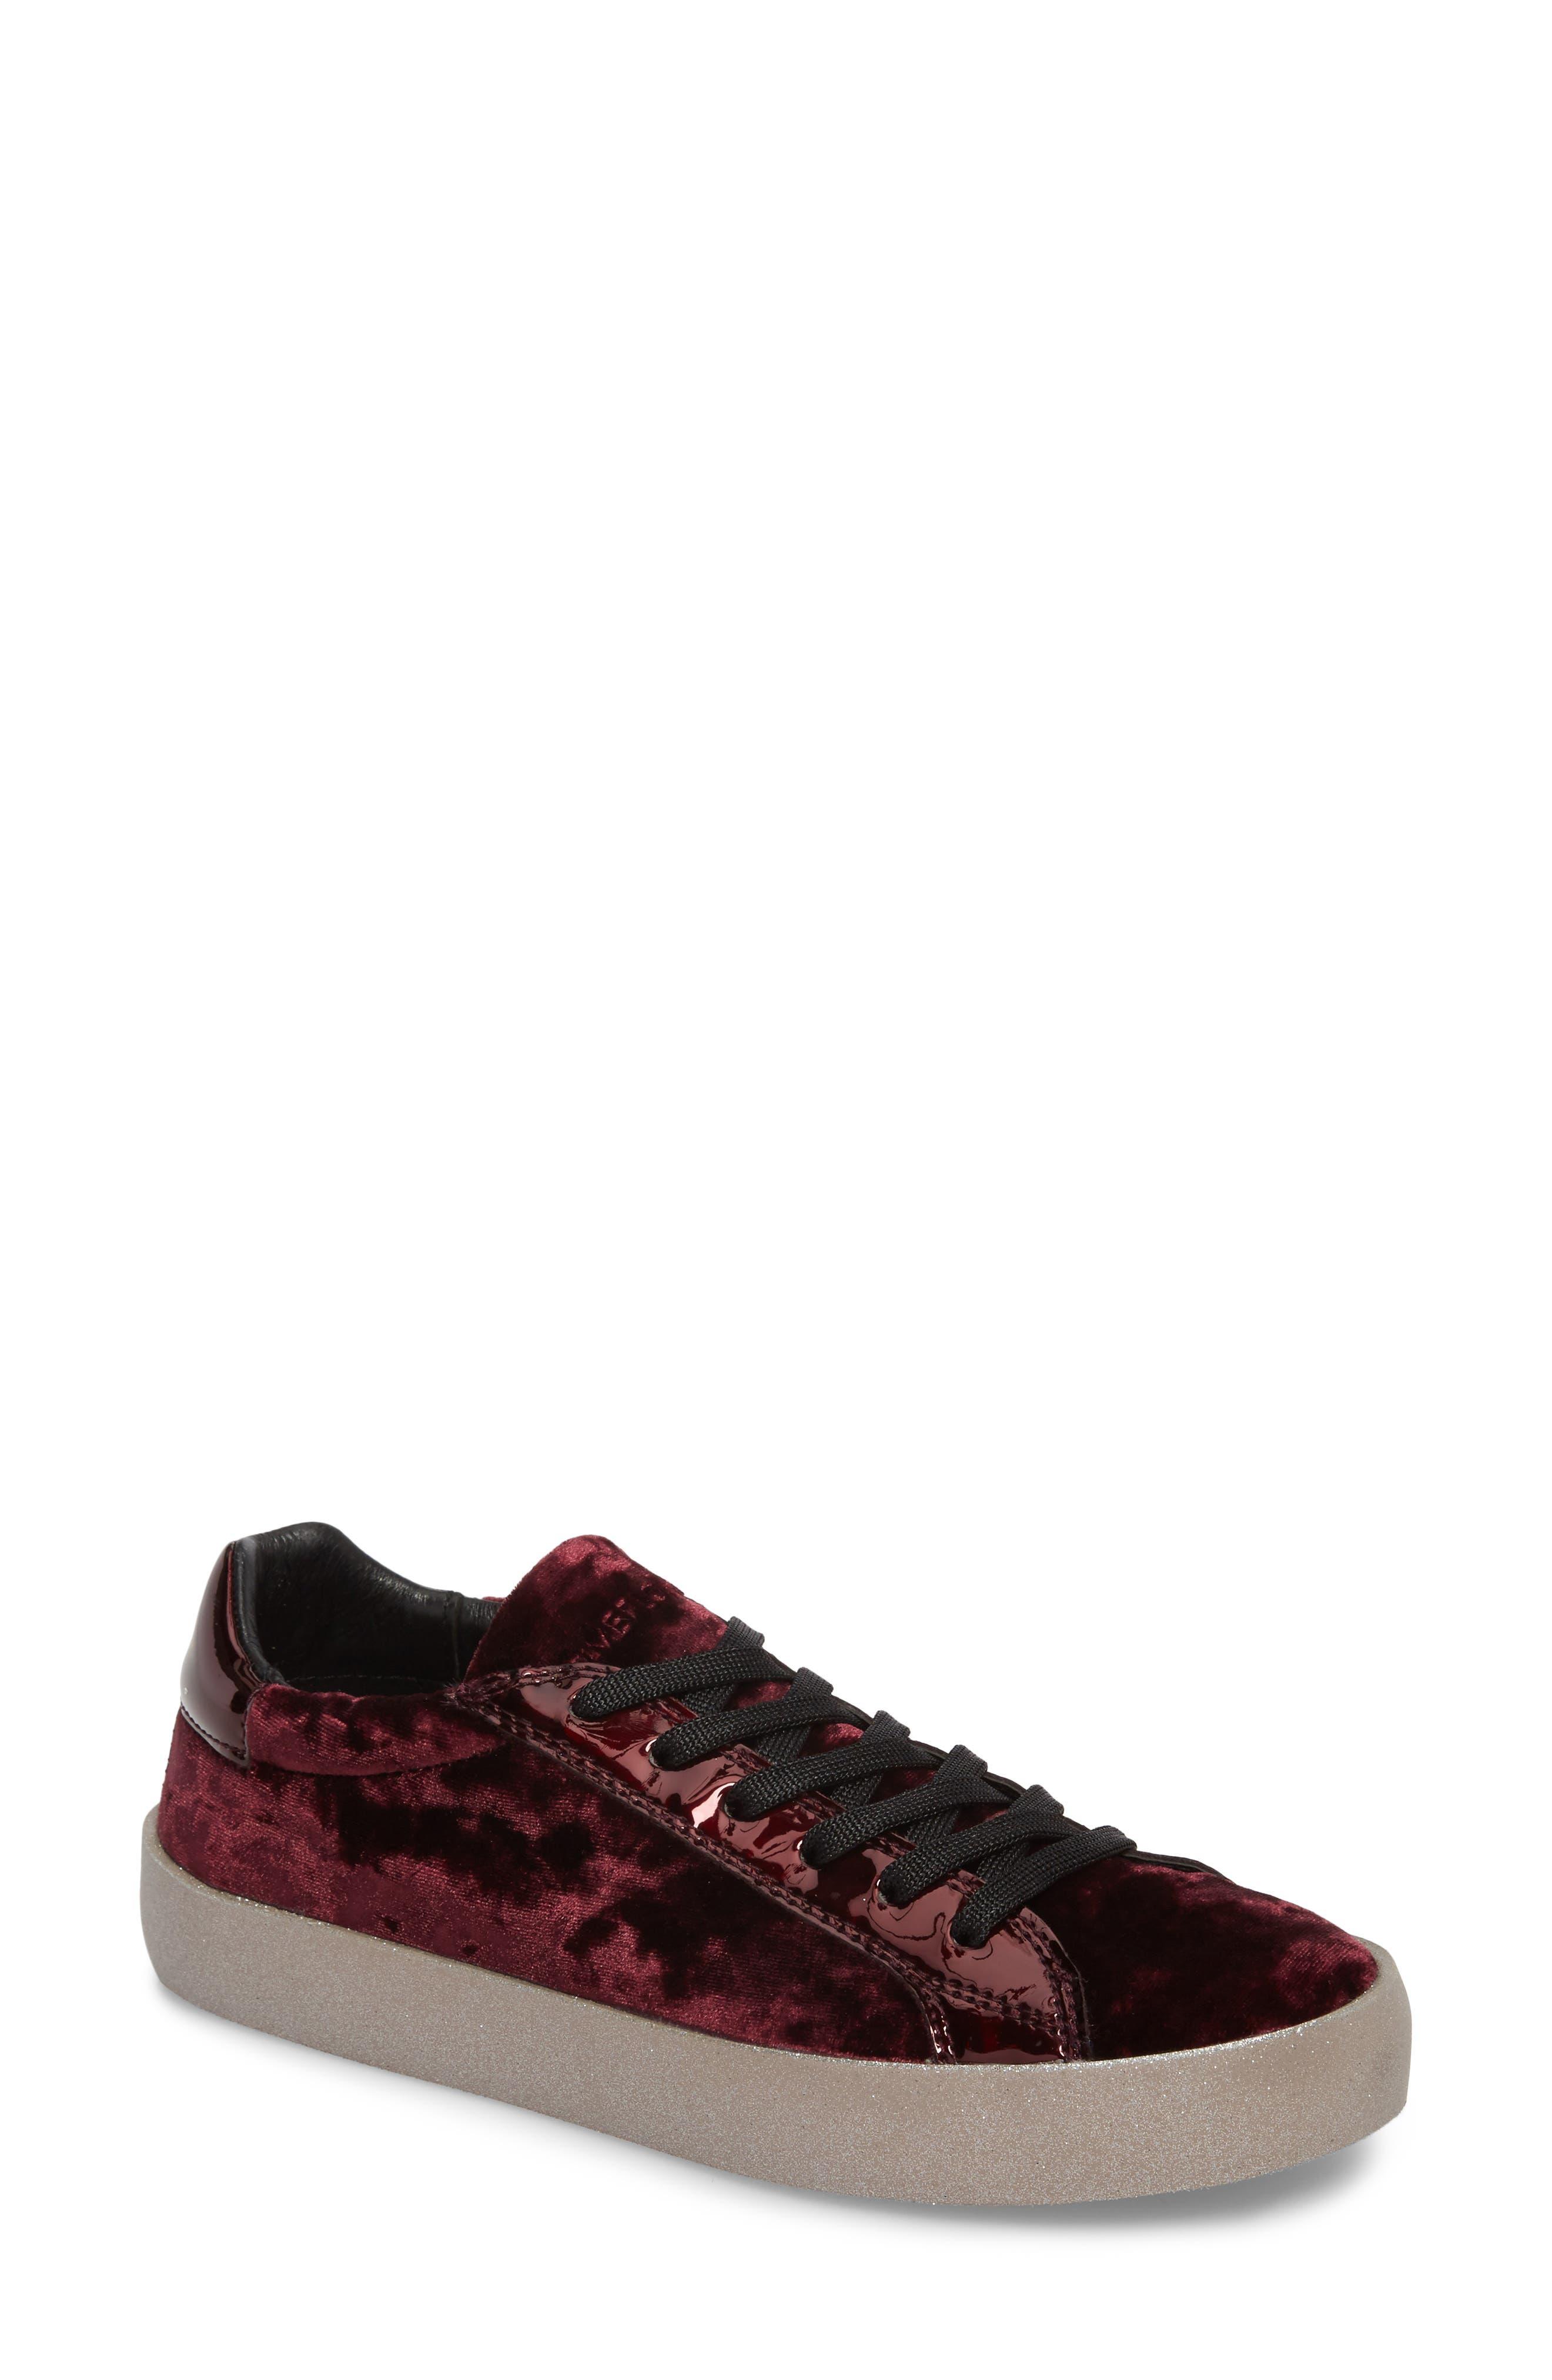 Dynamite Sneaker,                         Main,                         color, Burgundy